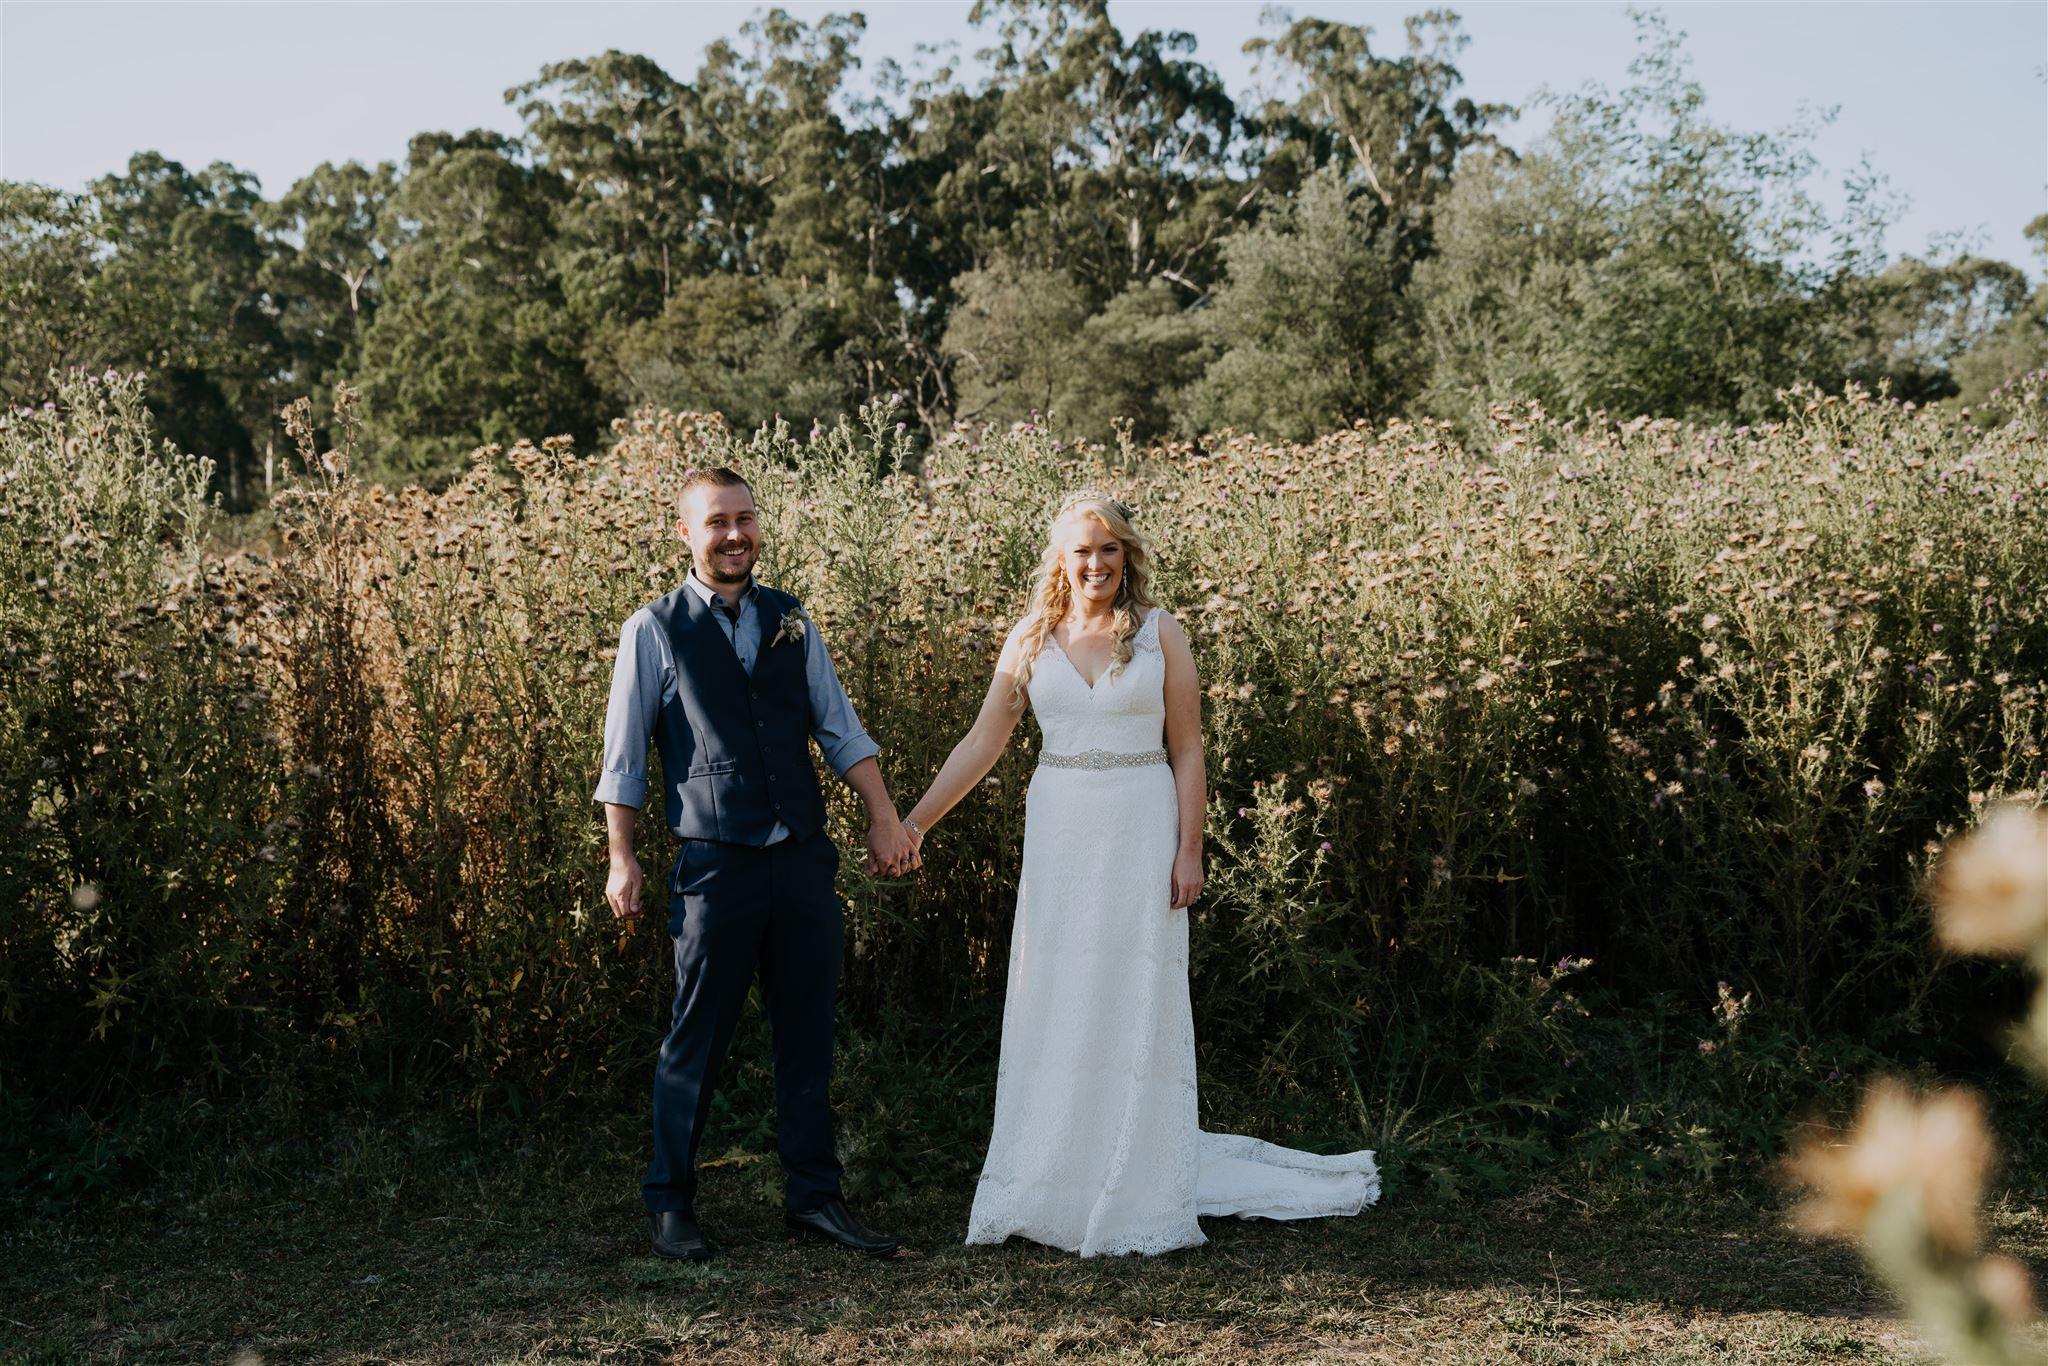 Penny-and-Neil-Riverstone-Estate-Wedding-0489_websize.jpg